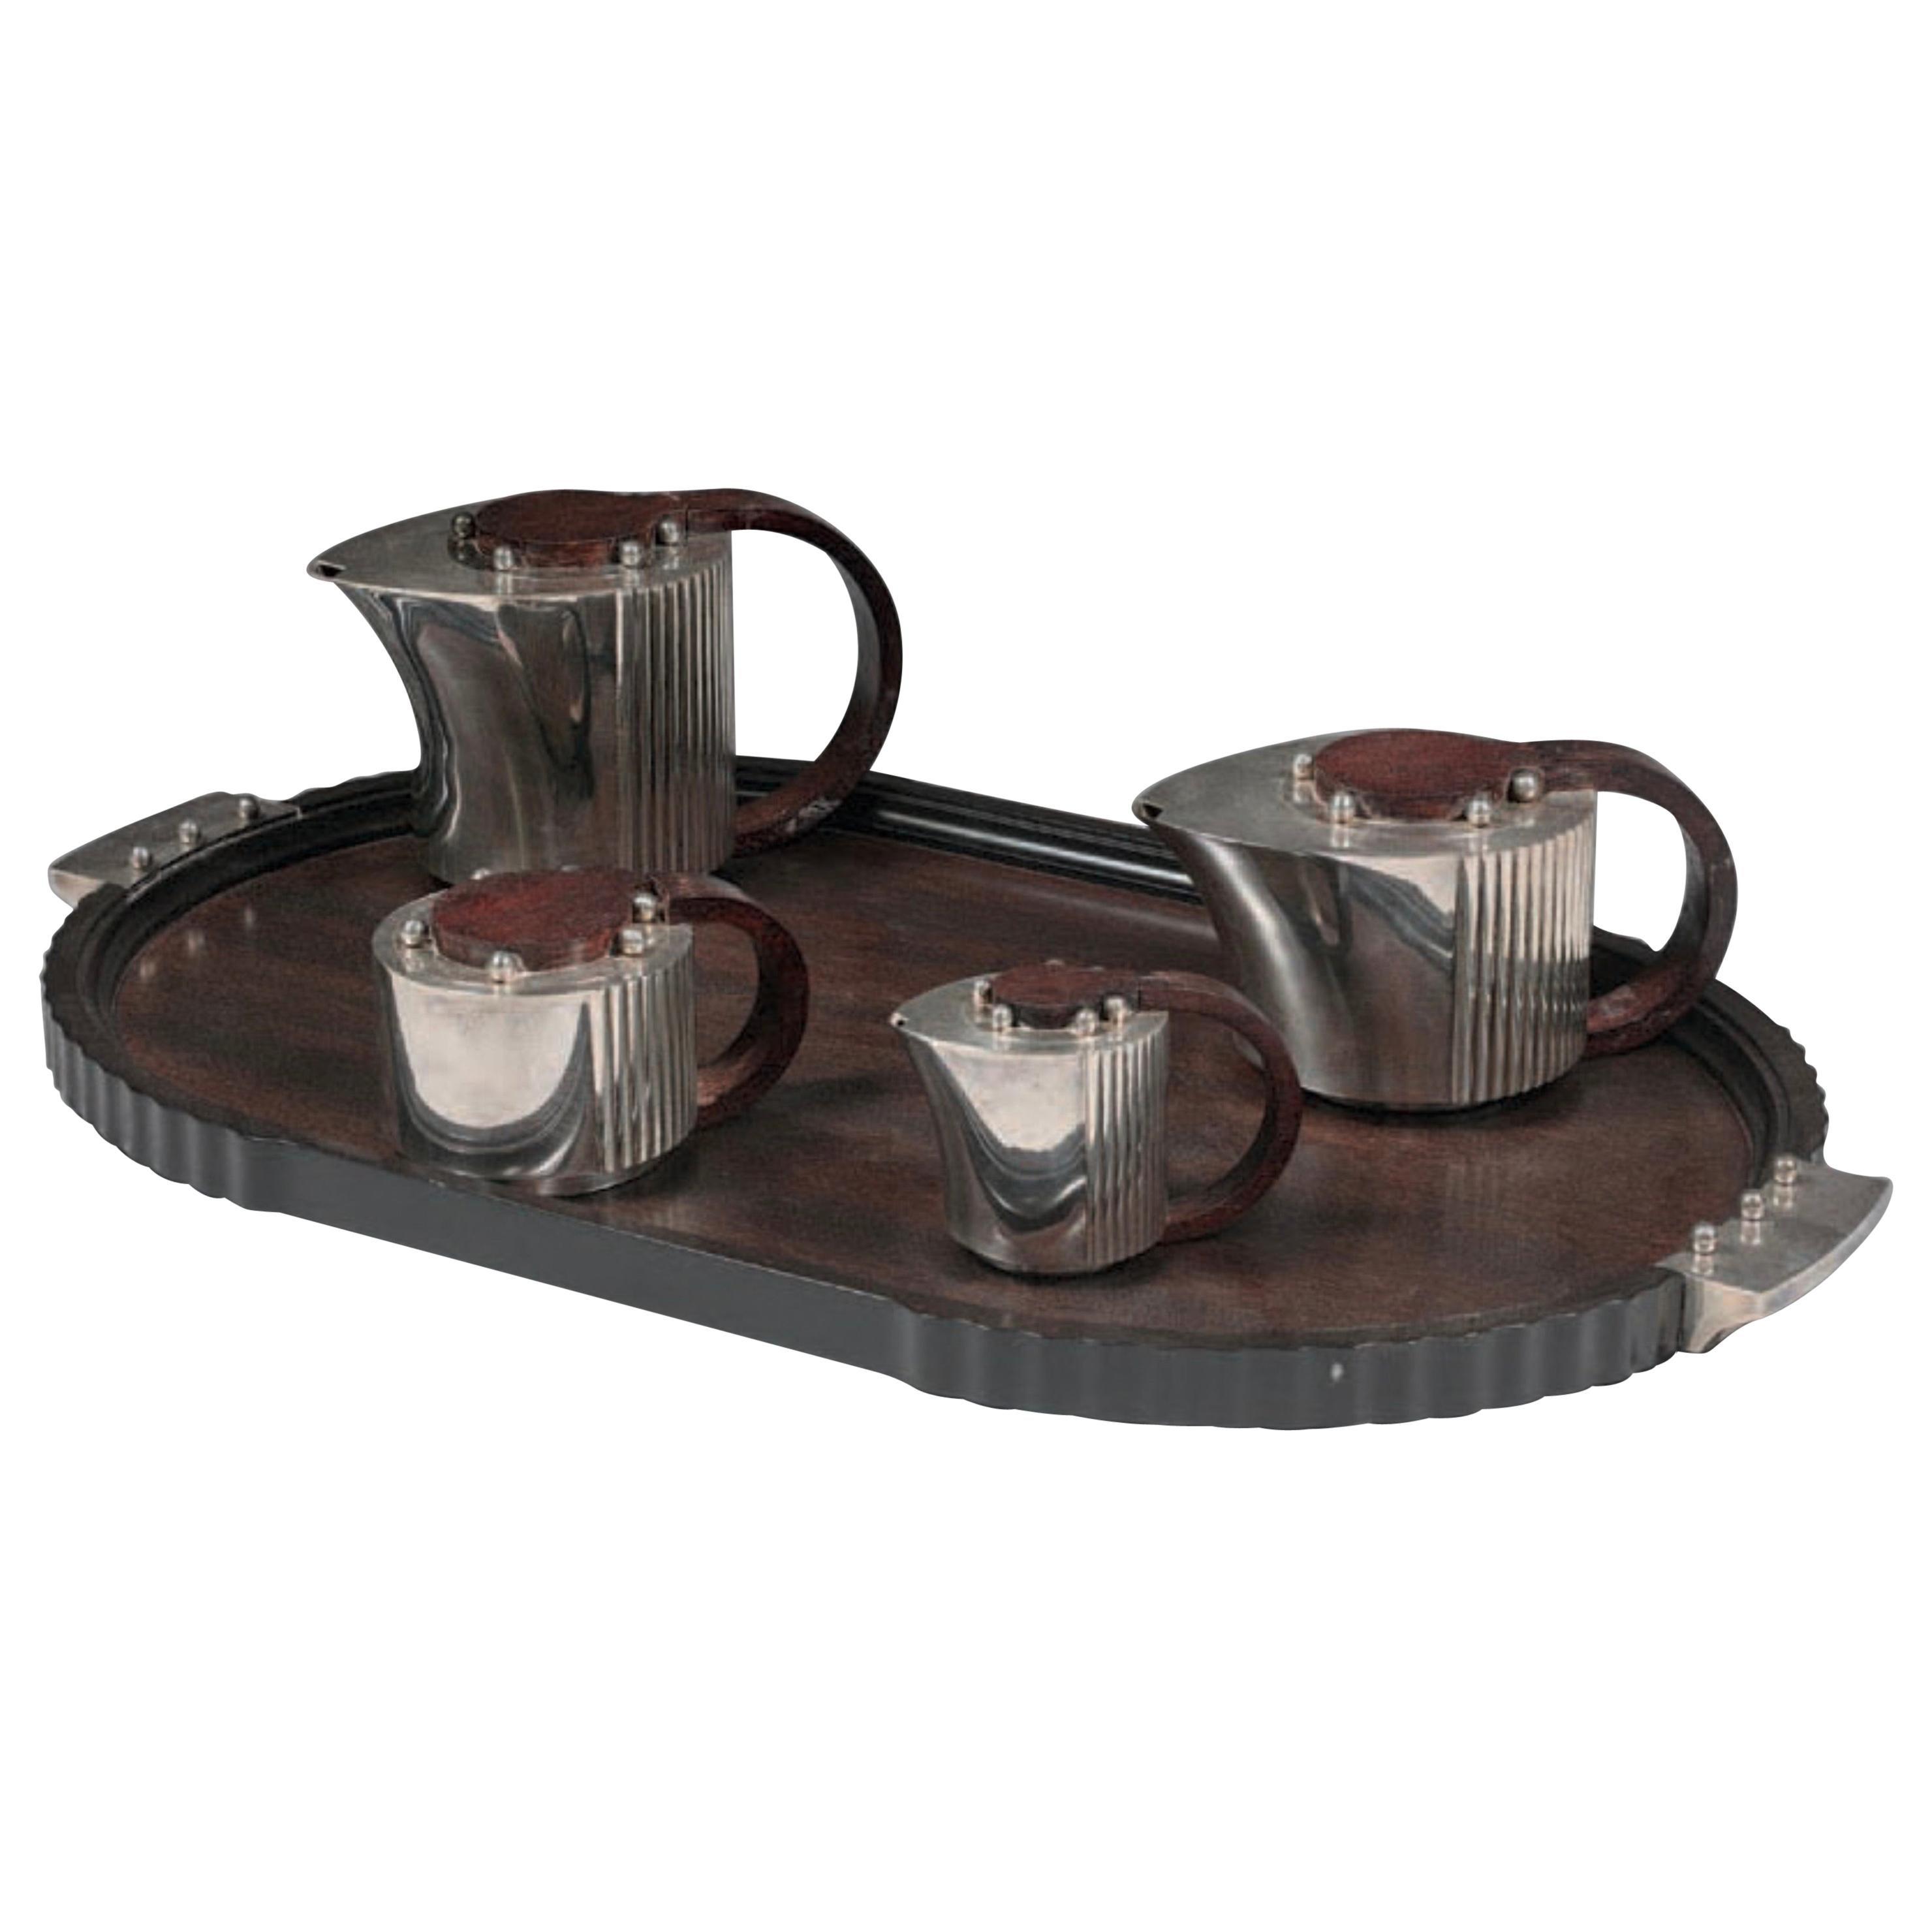 Jean Puiforcat Silver Plated Tea Set